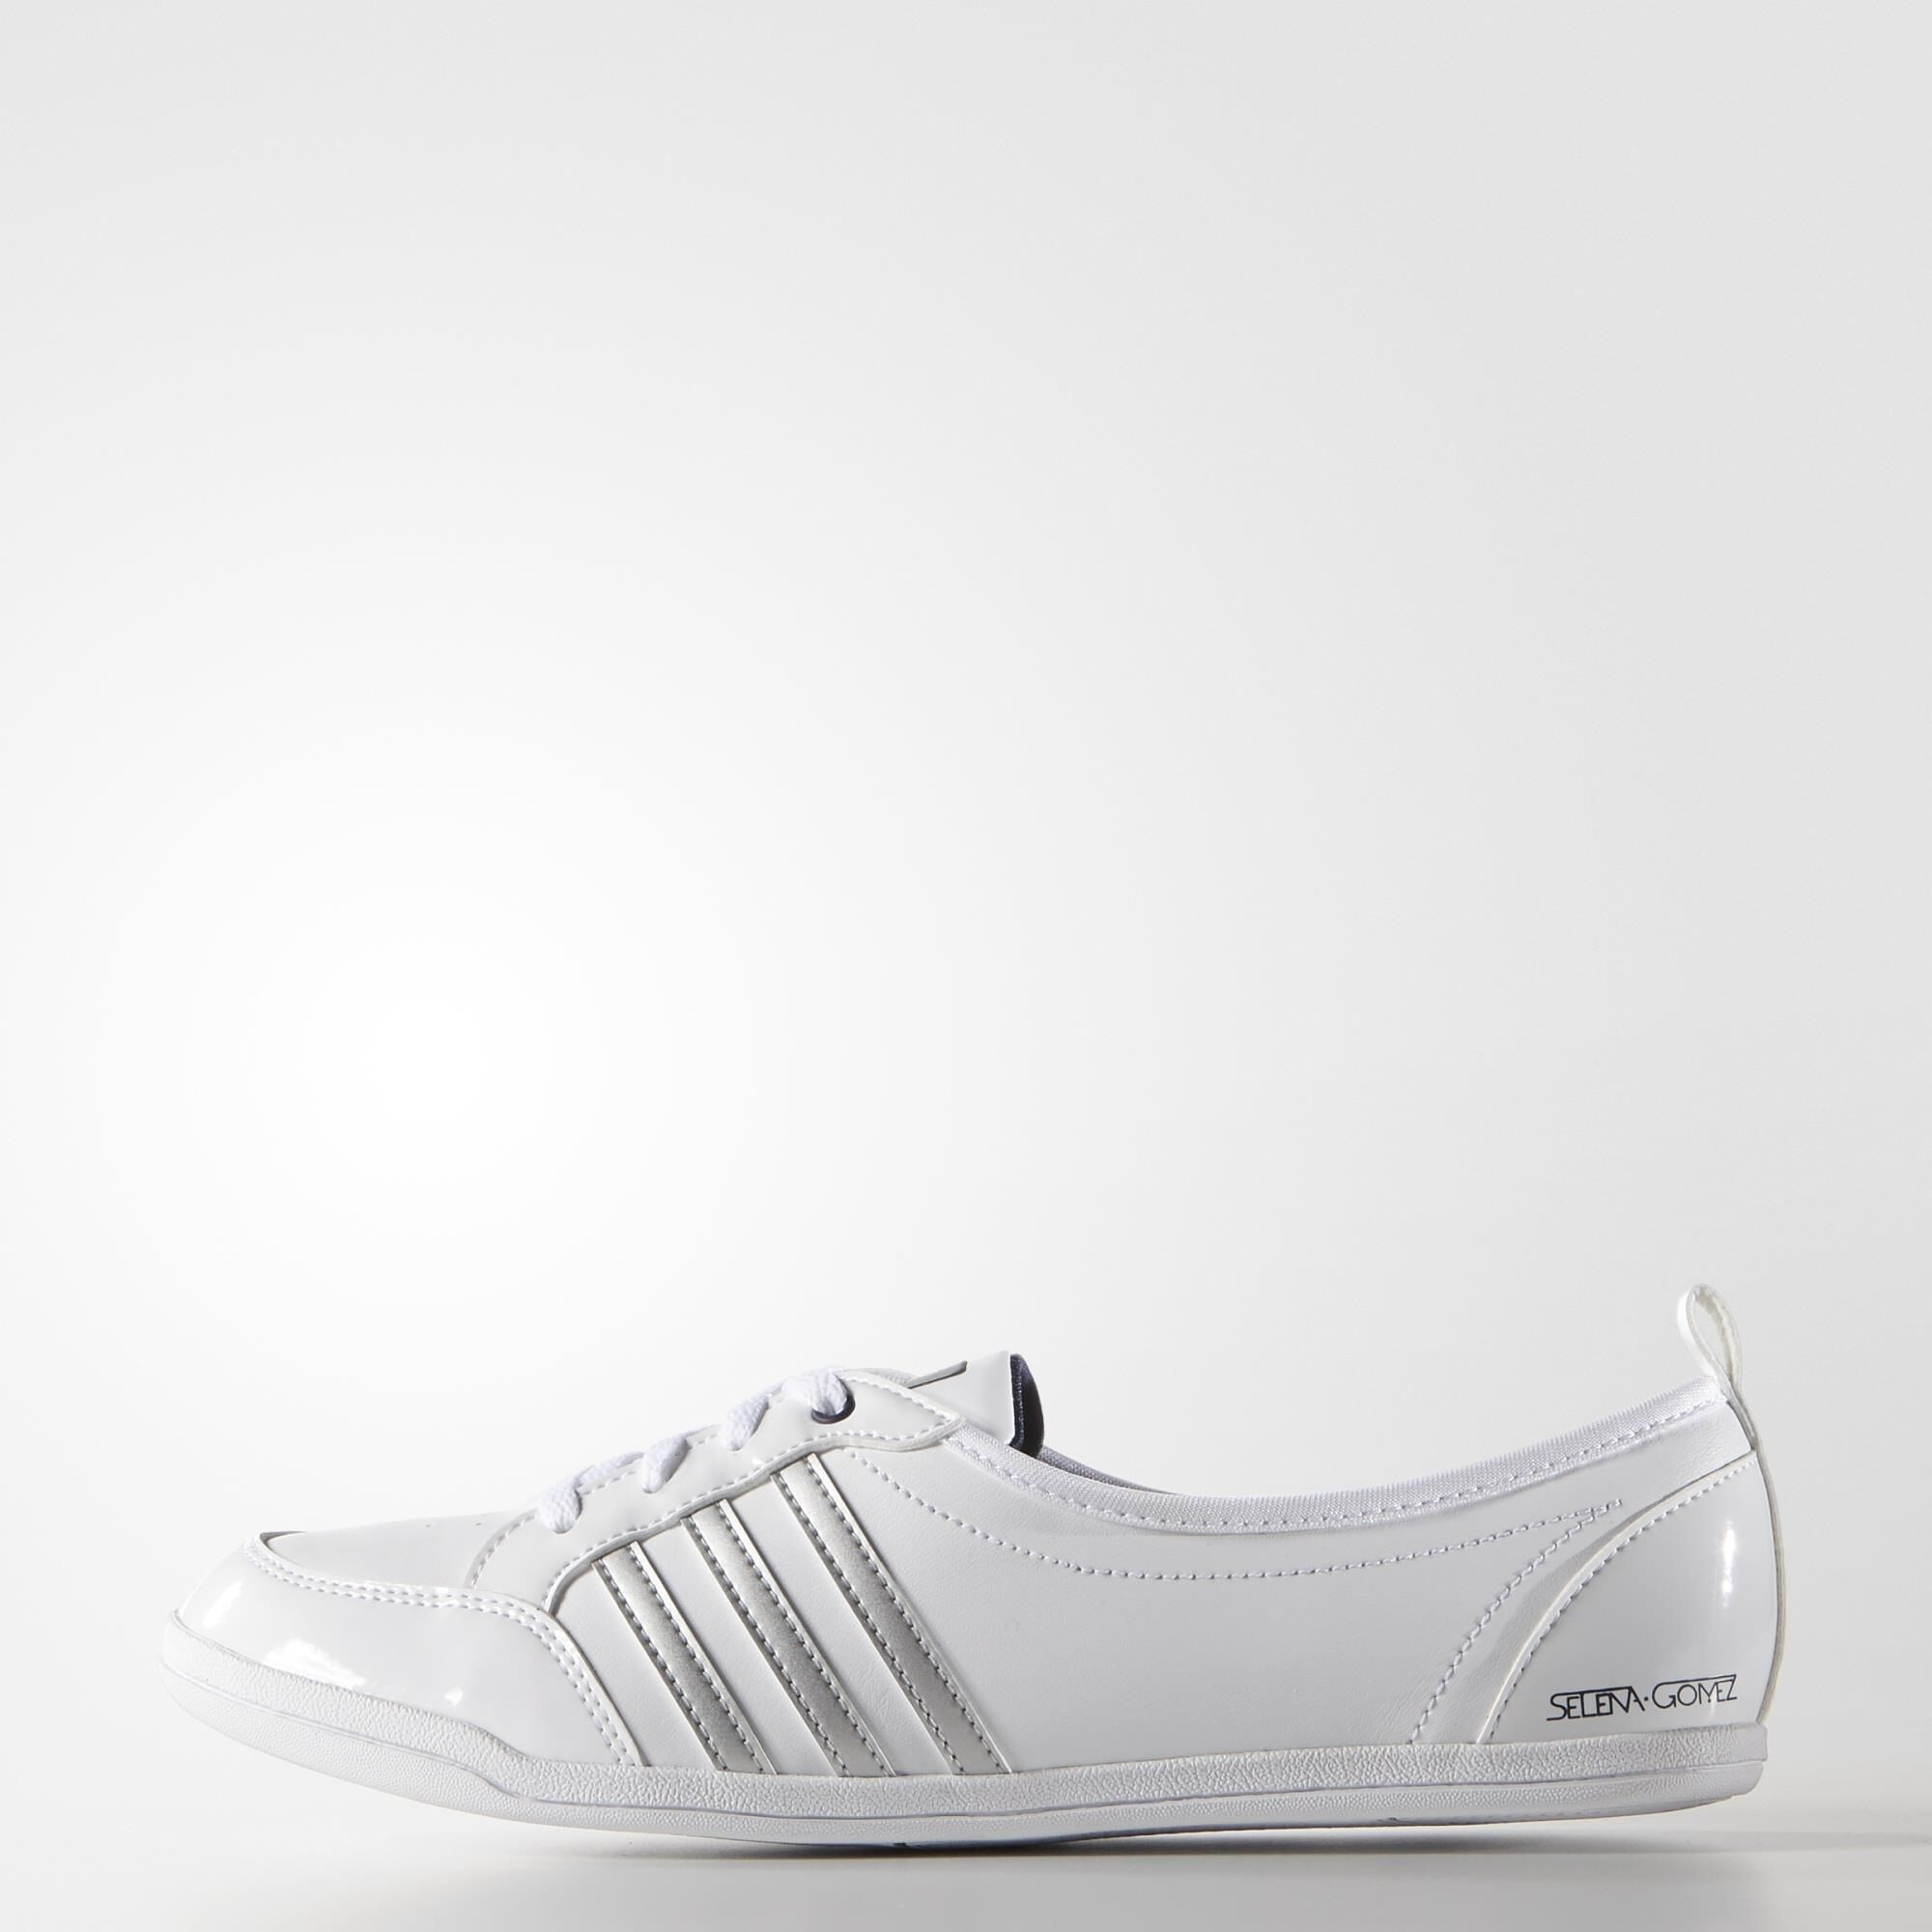 adidas selena gomez neo shoes